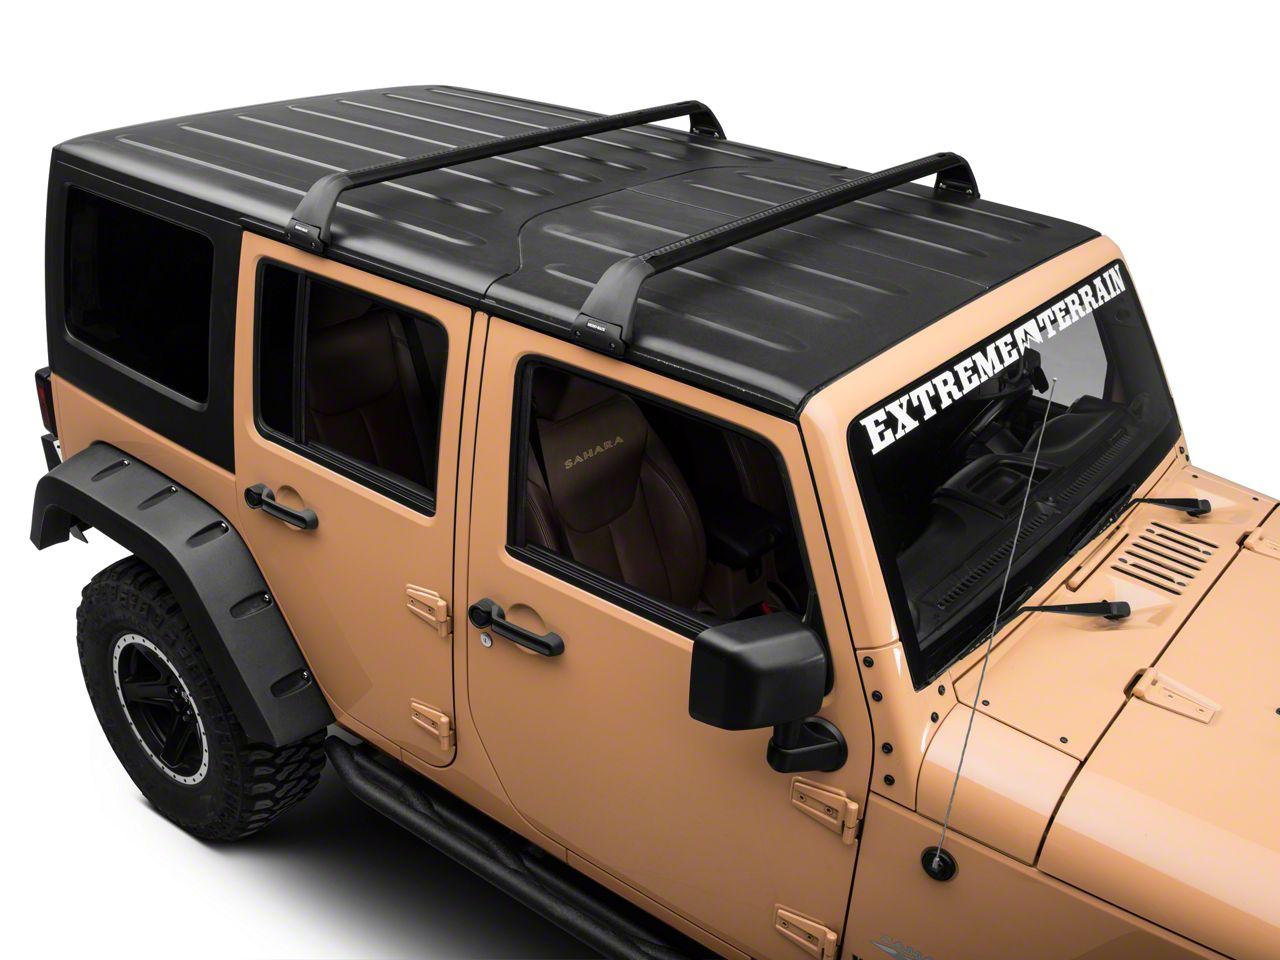 Rhino-Rack Vortex SG 2 Bar Roof Rack - Black (07-10 Jeep Wrangler JK 2 Door; 07-18 Jeep Wrangler JK 4 Door; 18-19 Jeep Wrangler JL 4 Door)